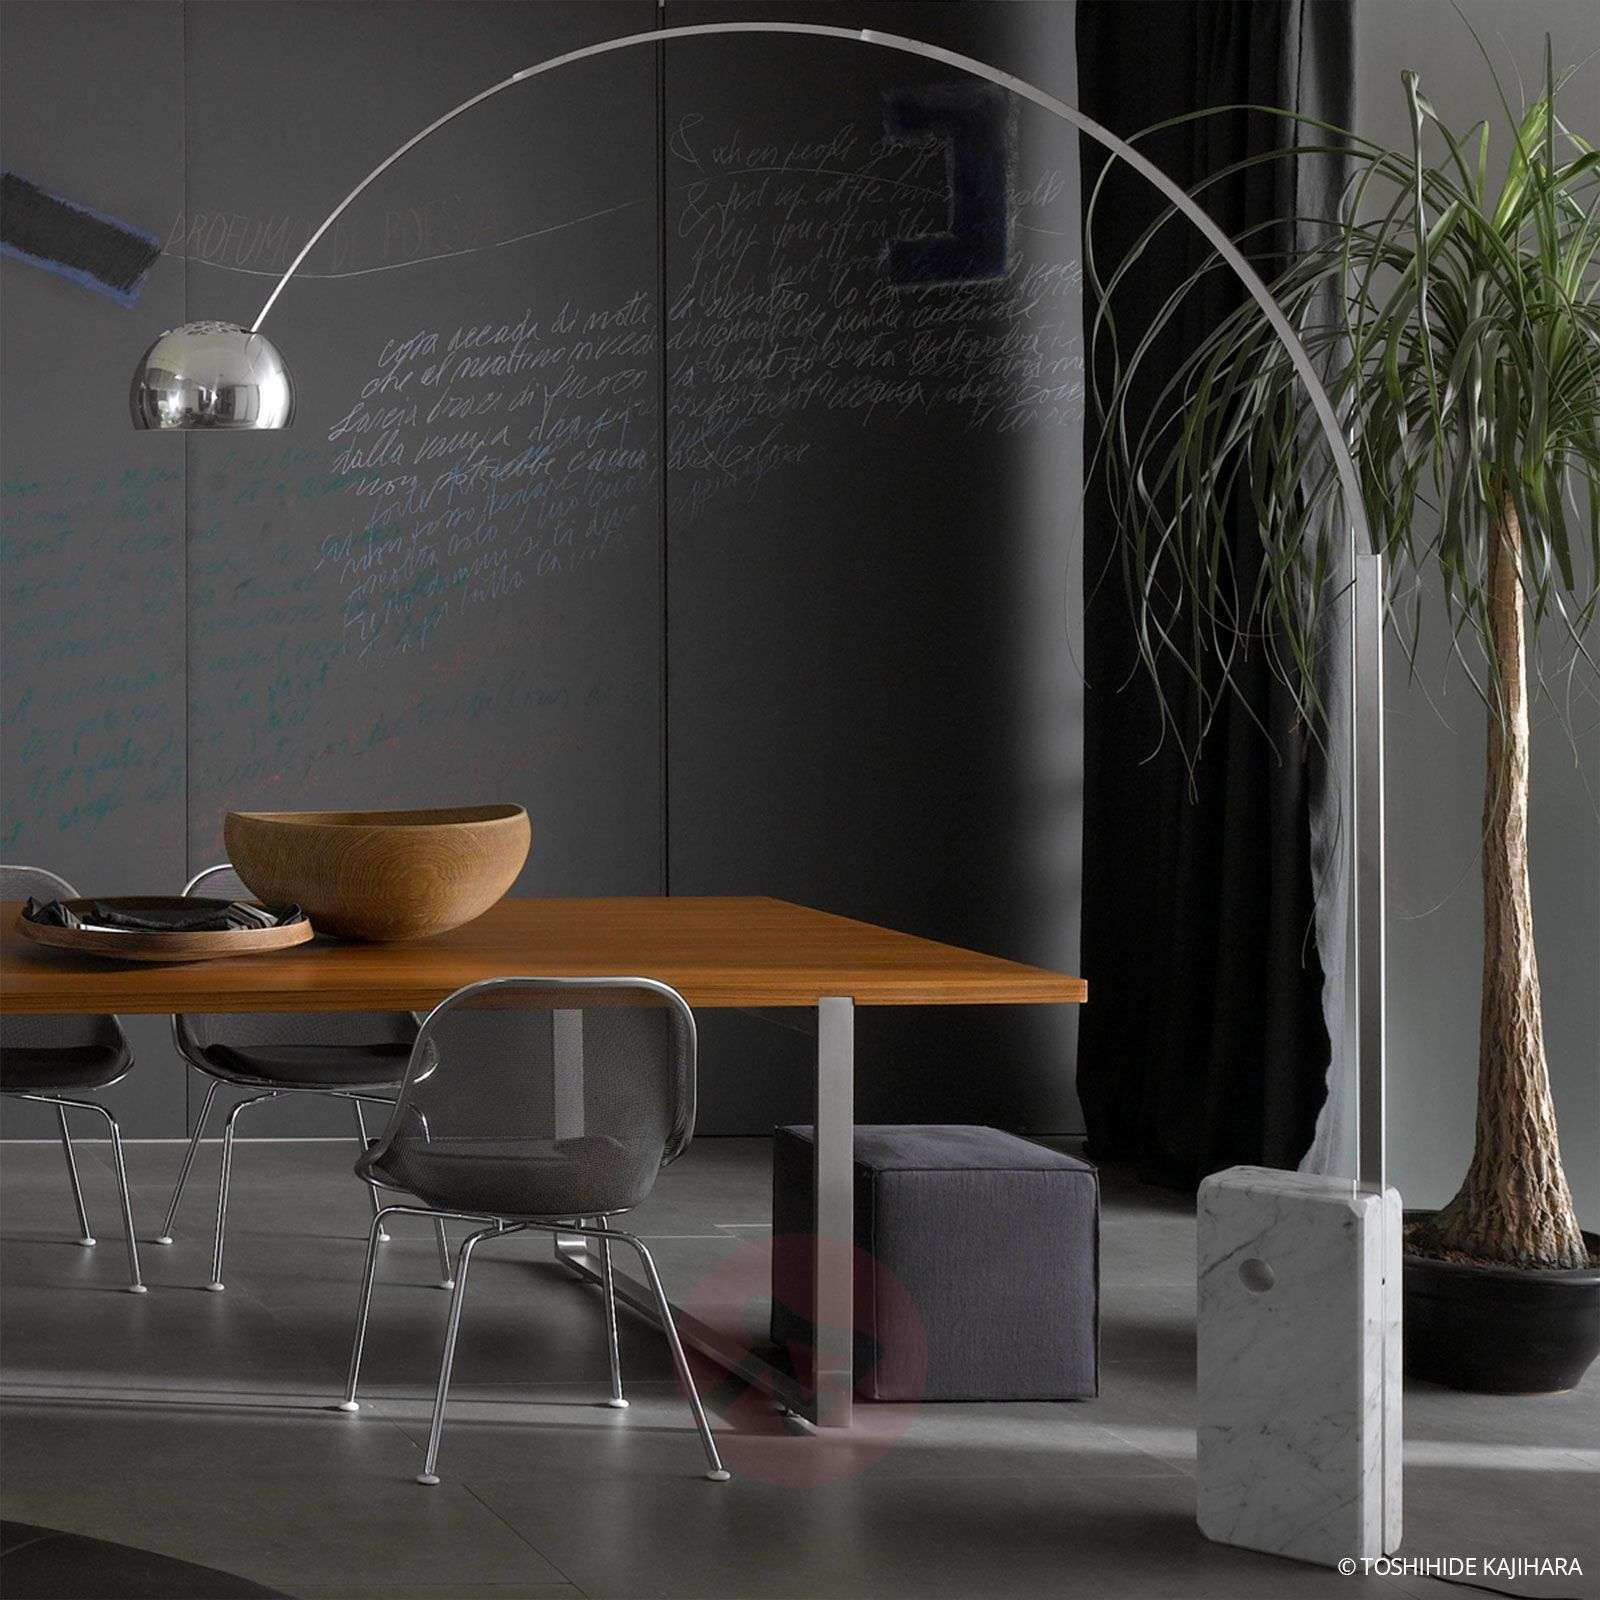 Arco revolutionary LED arc lamp-3510003-06